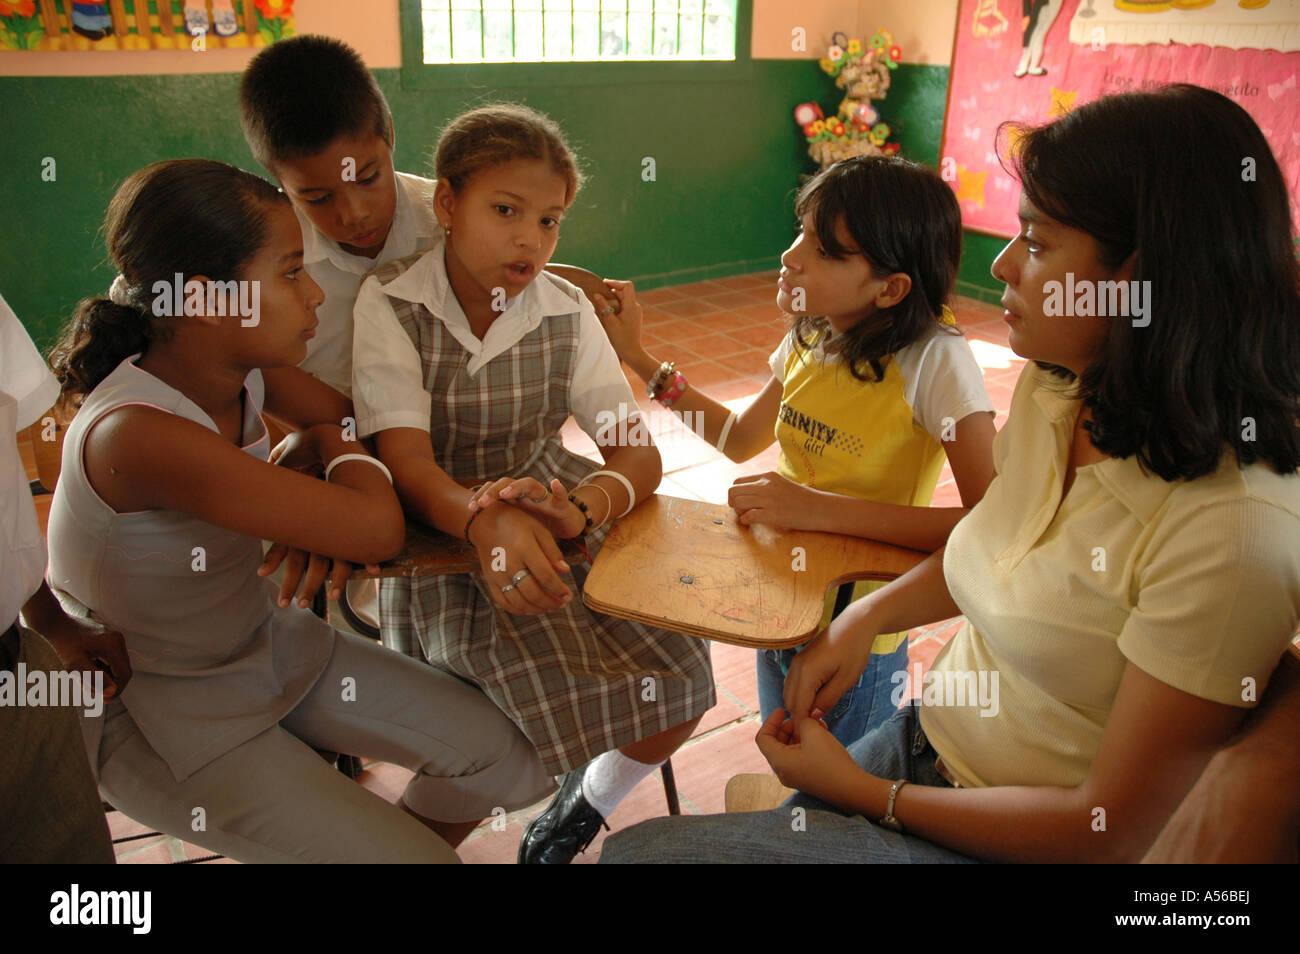 Painet iy8257 children kids teacher colombia extracurricular seminar middle school paz barrancabermeja discuss violence - Stock Image